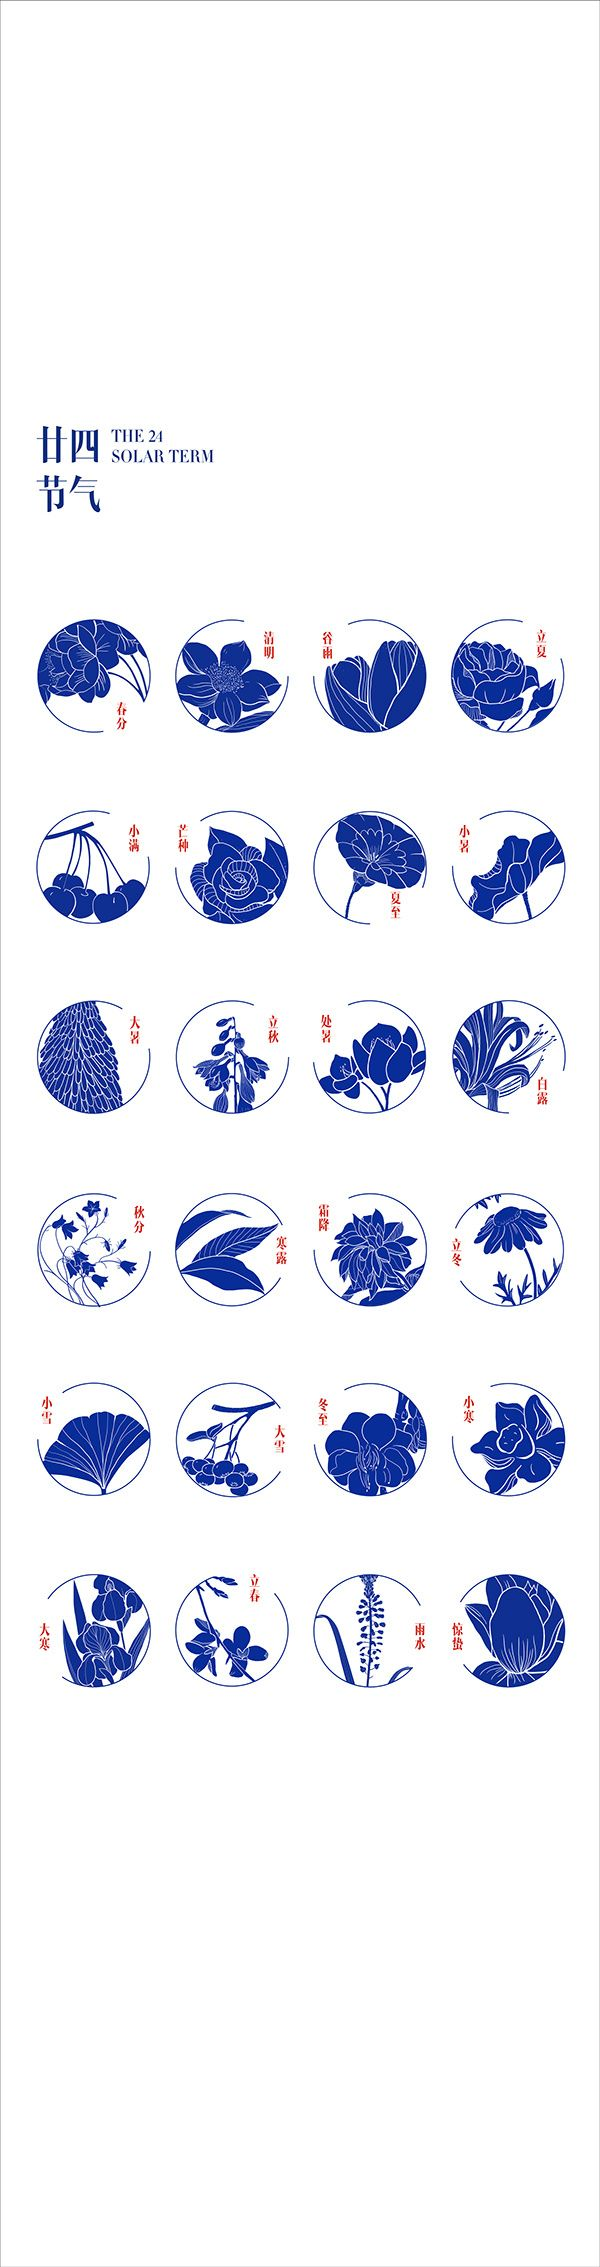 Chinese Lunar Calend...@朝九晚十采集到东方(170图)_花瓣